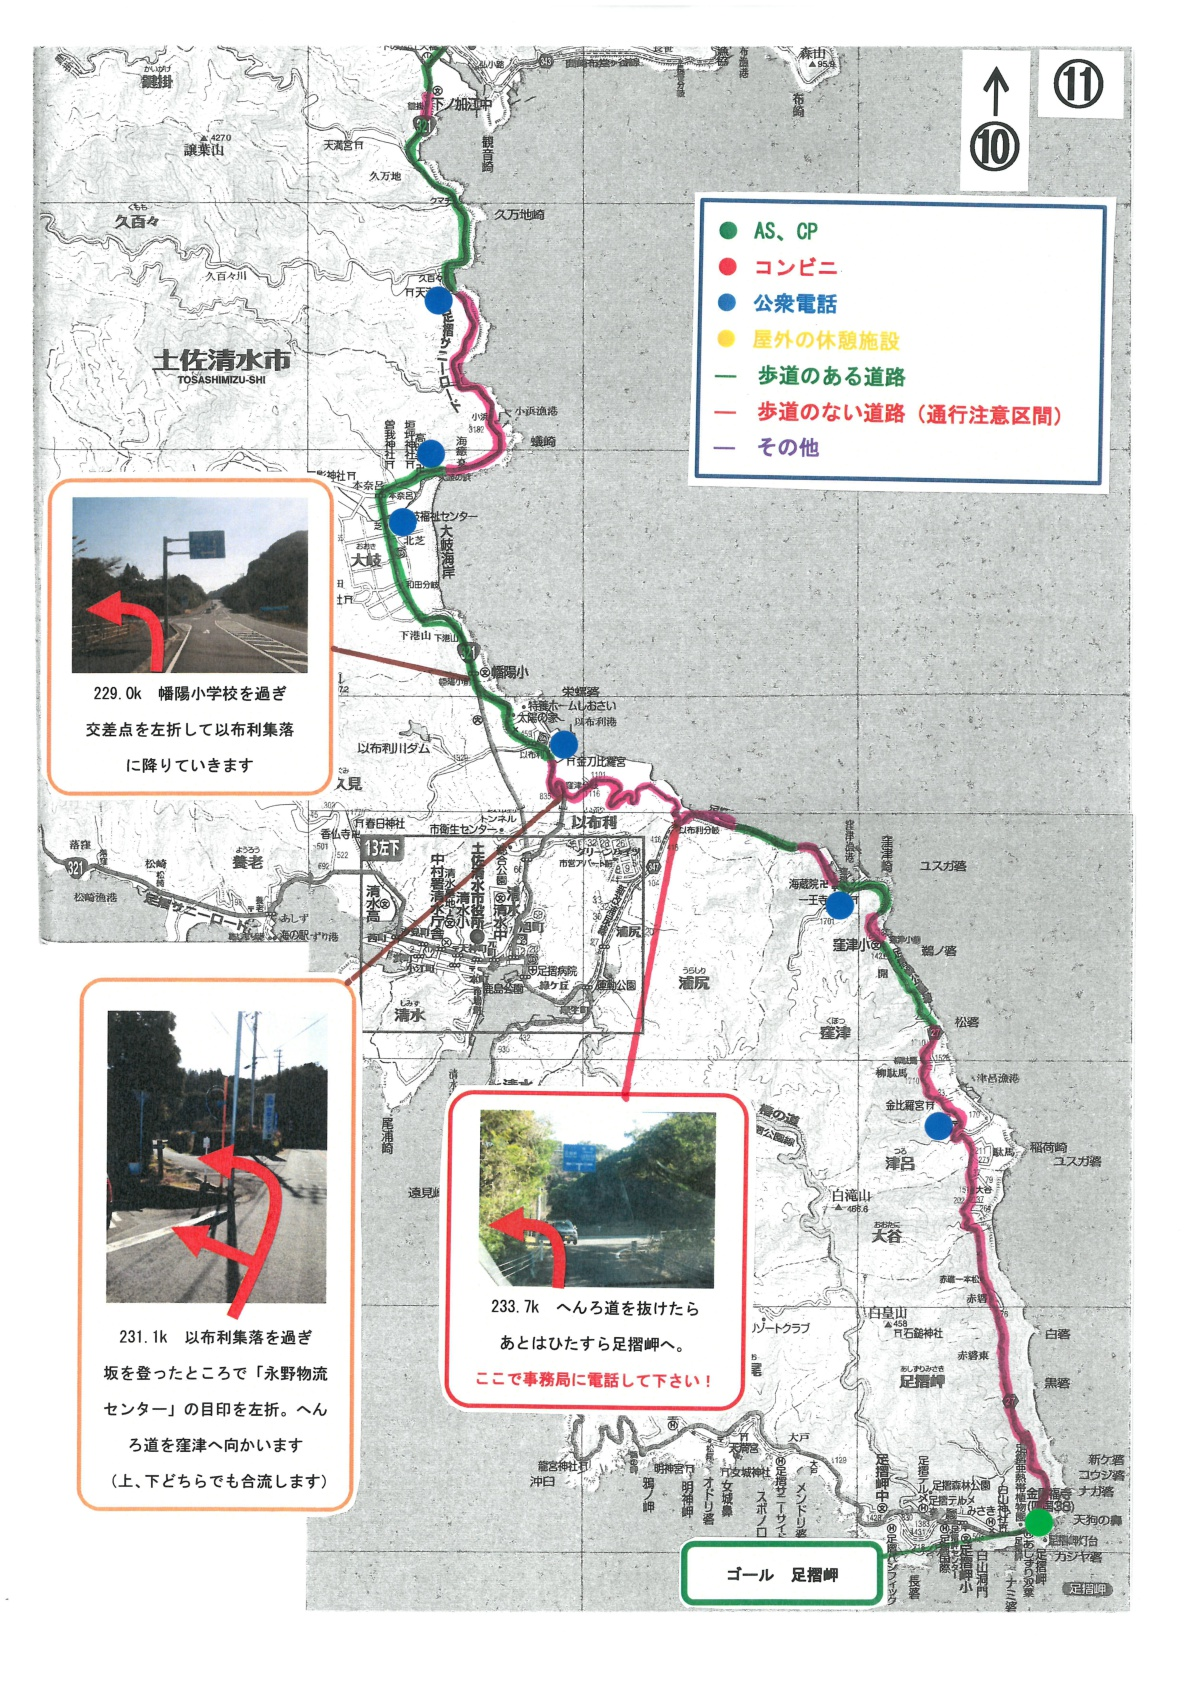 map11_s-001.jpg